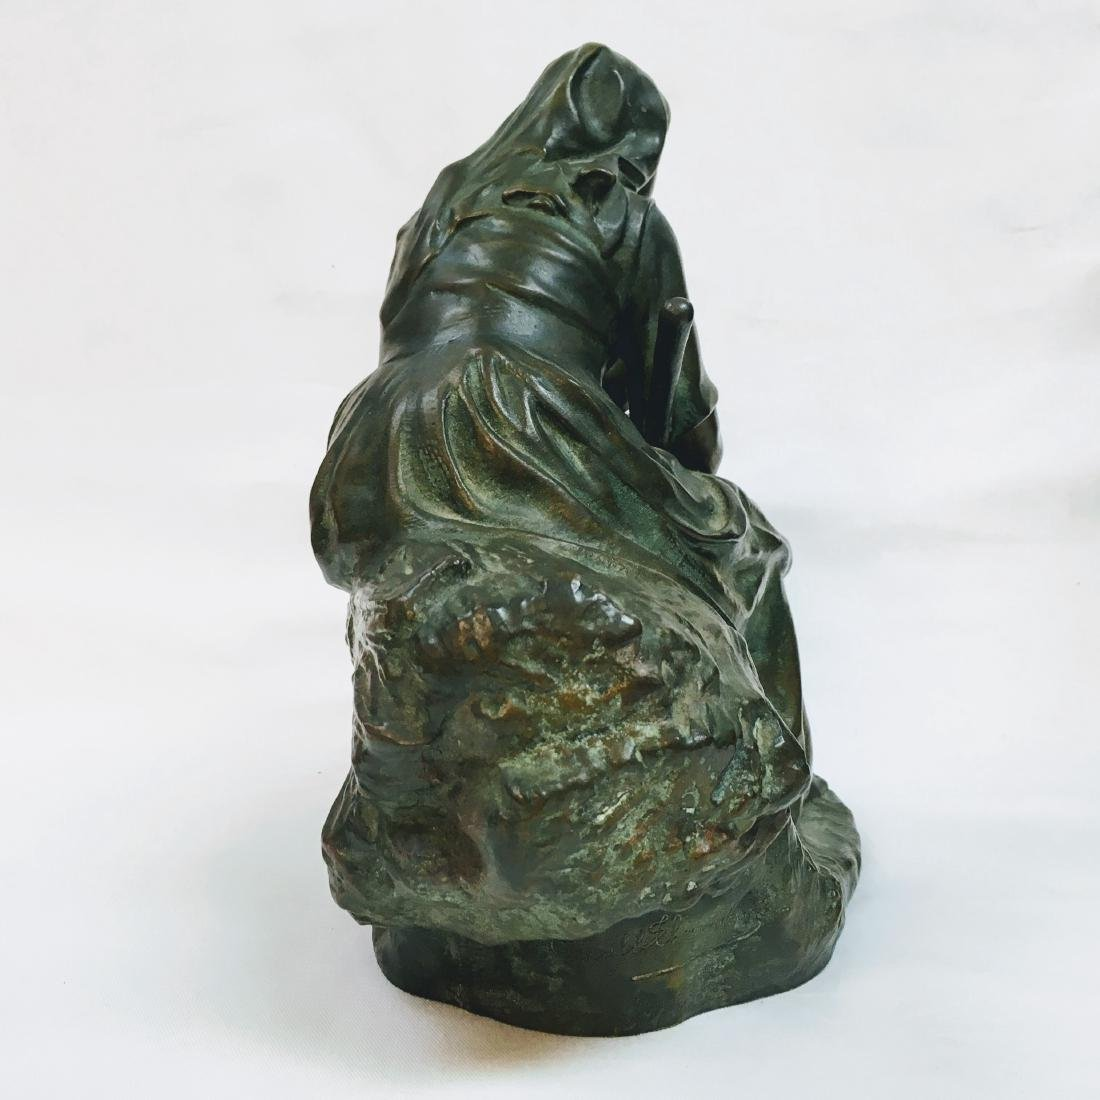 CORNEILLE HENRI THEUNISSEN 1863-1918 REVERIE AU CHAMP - 4